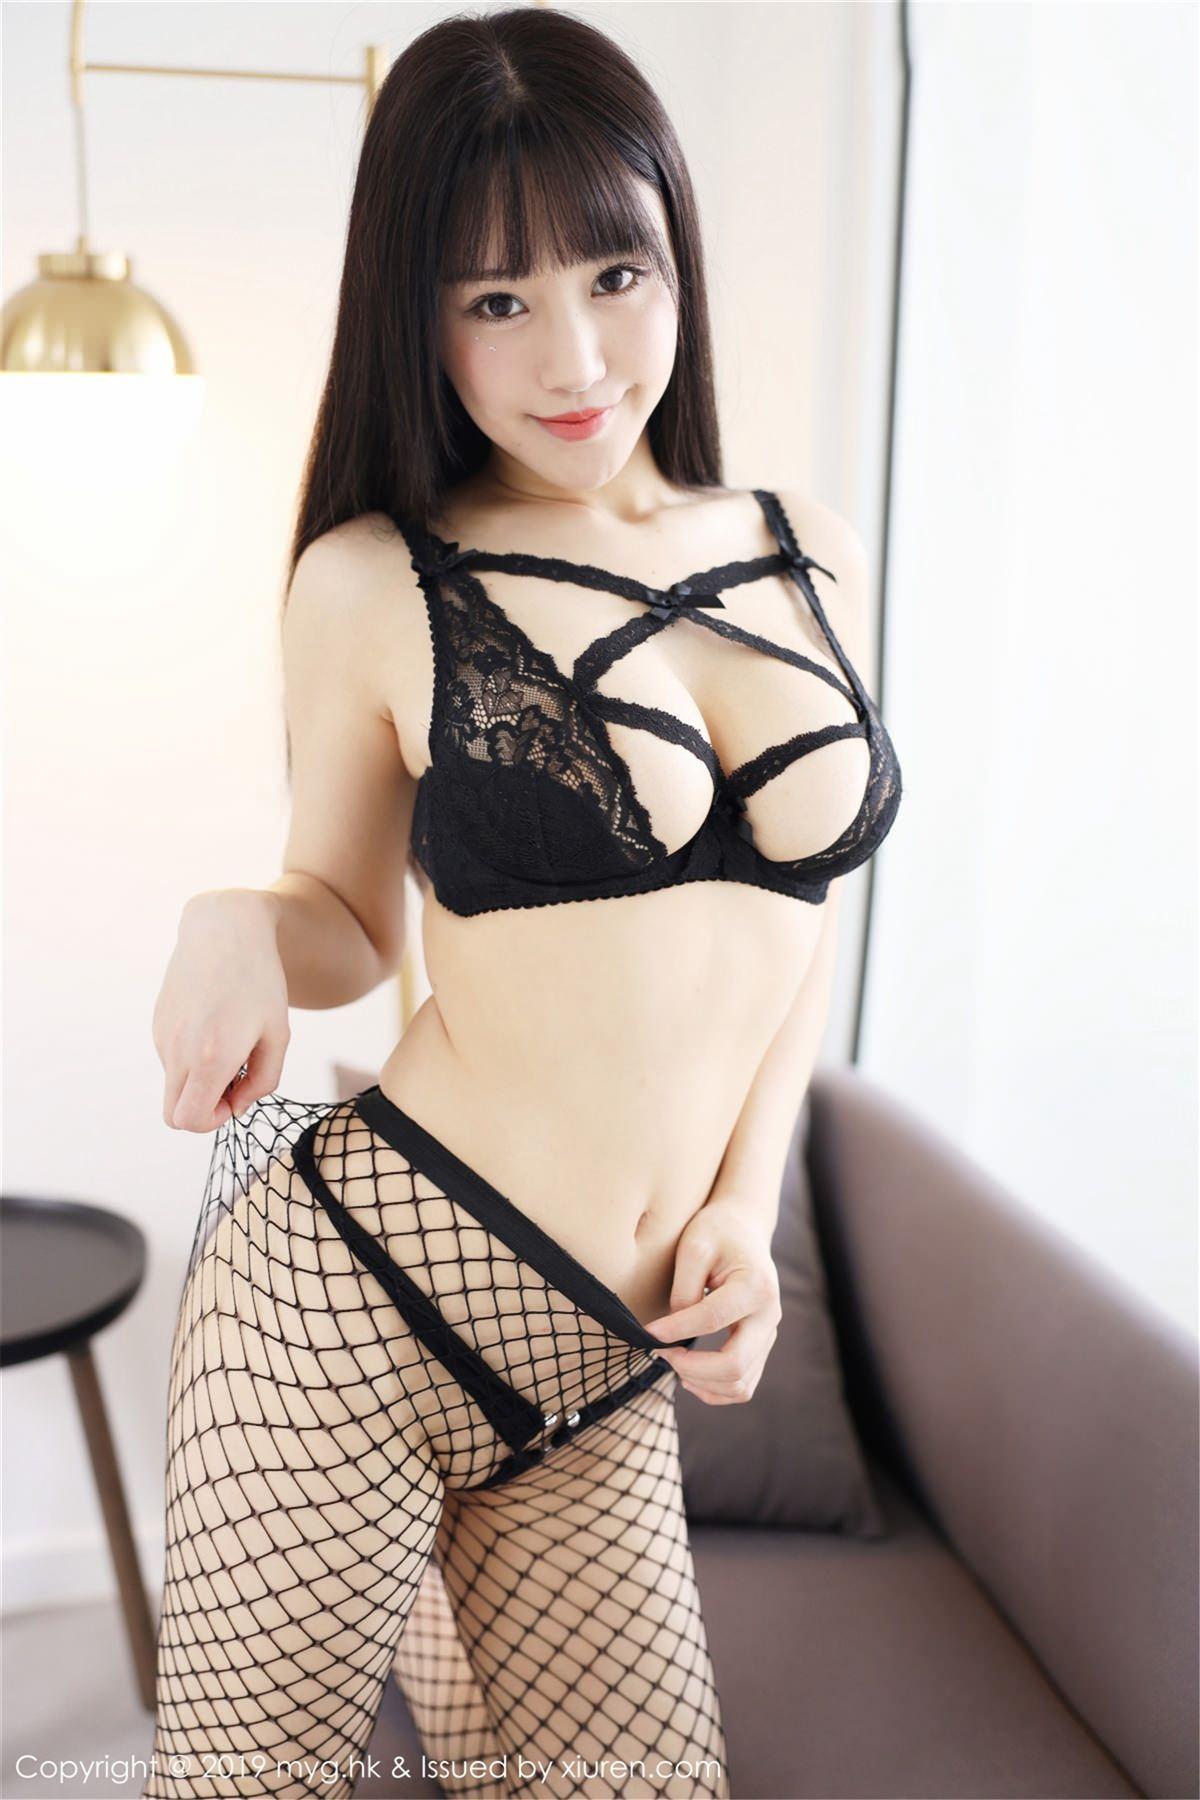 MyGirl Vol.357 28P, mygirl, Zhu Ke Er